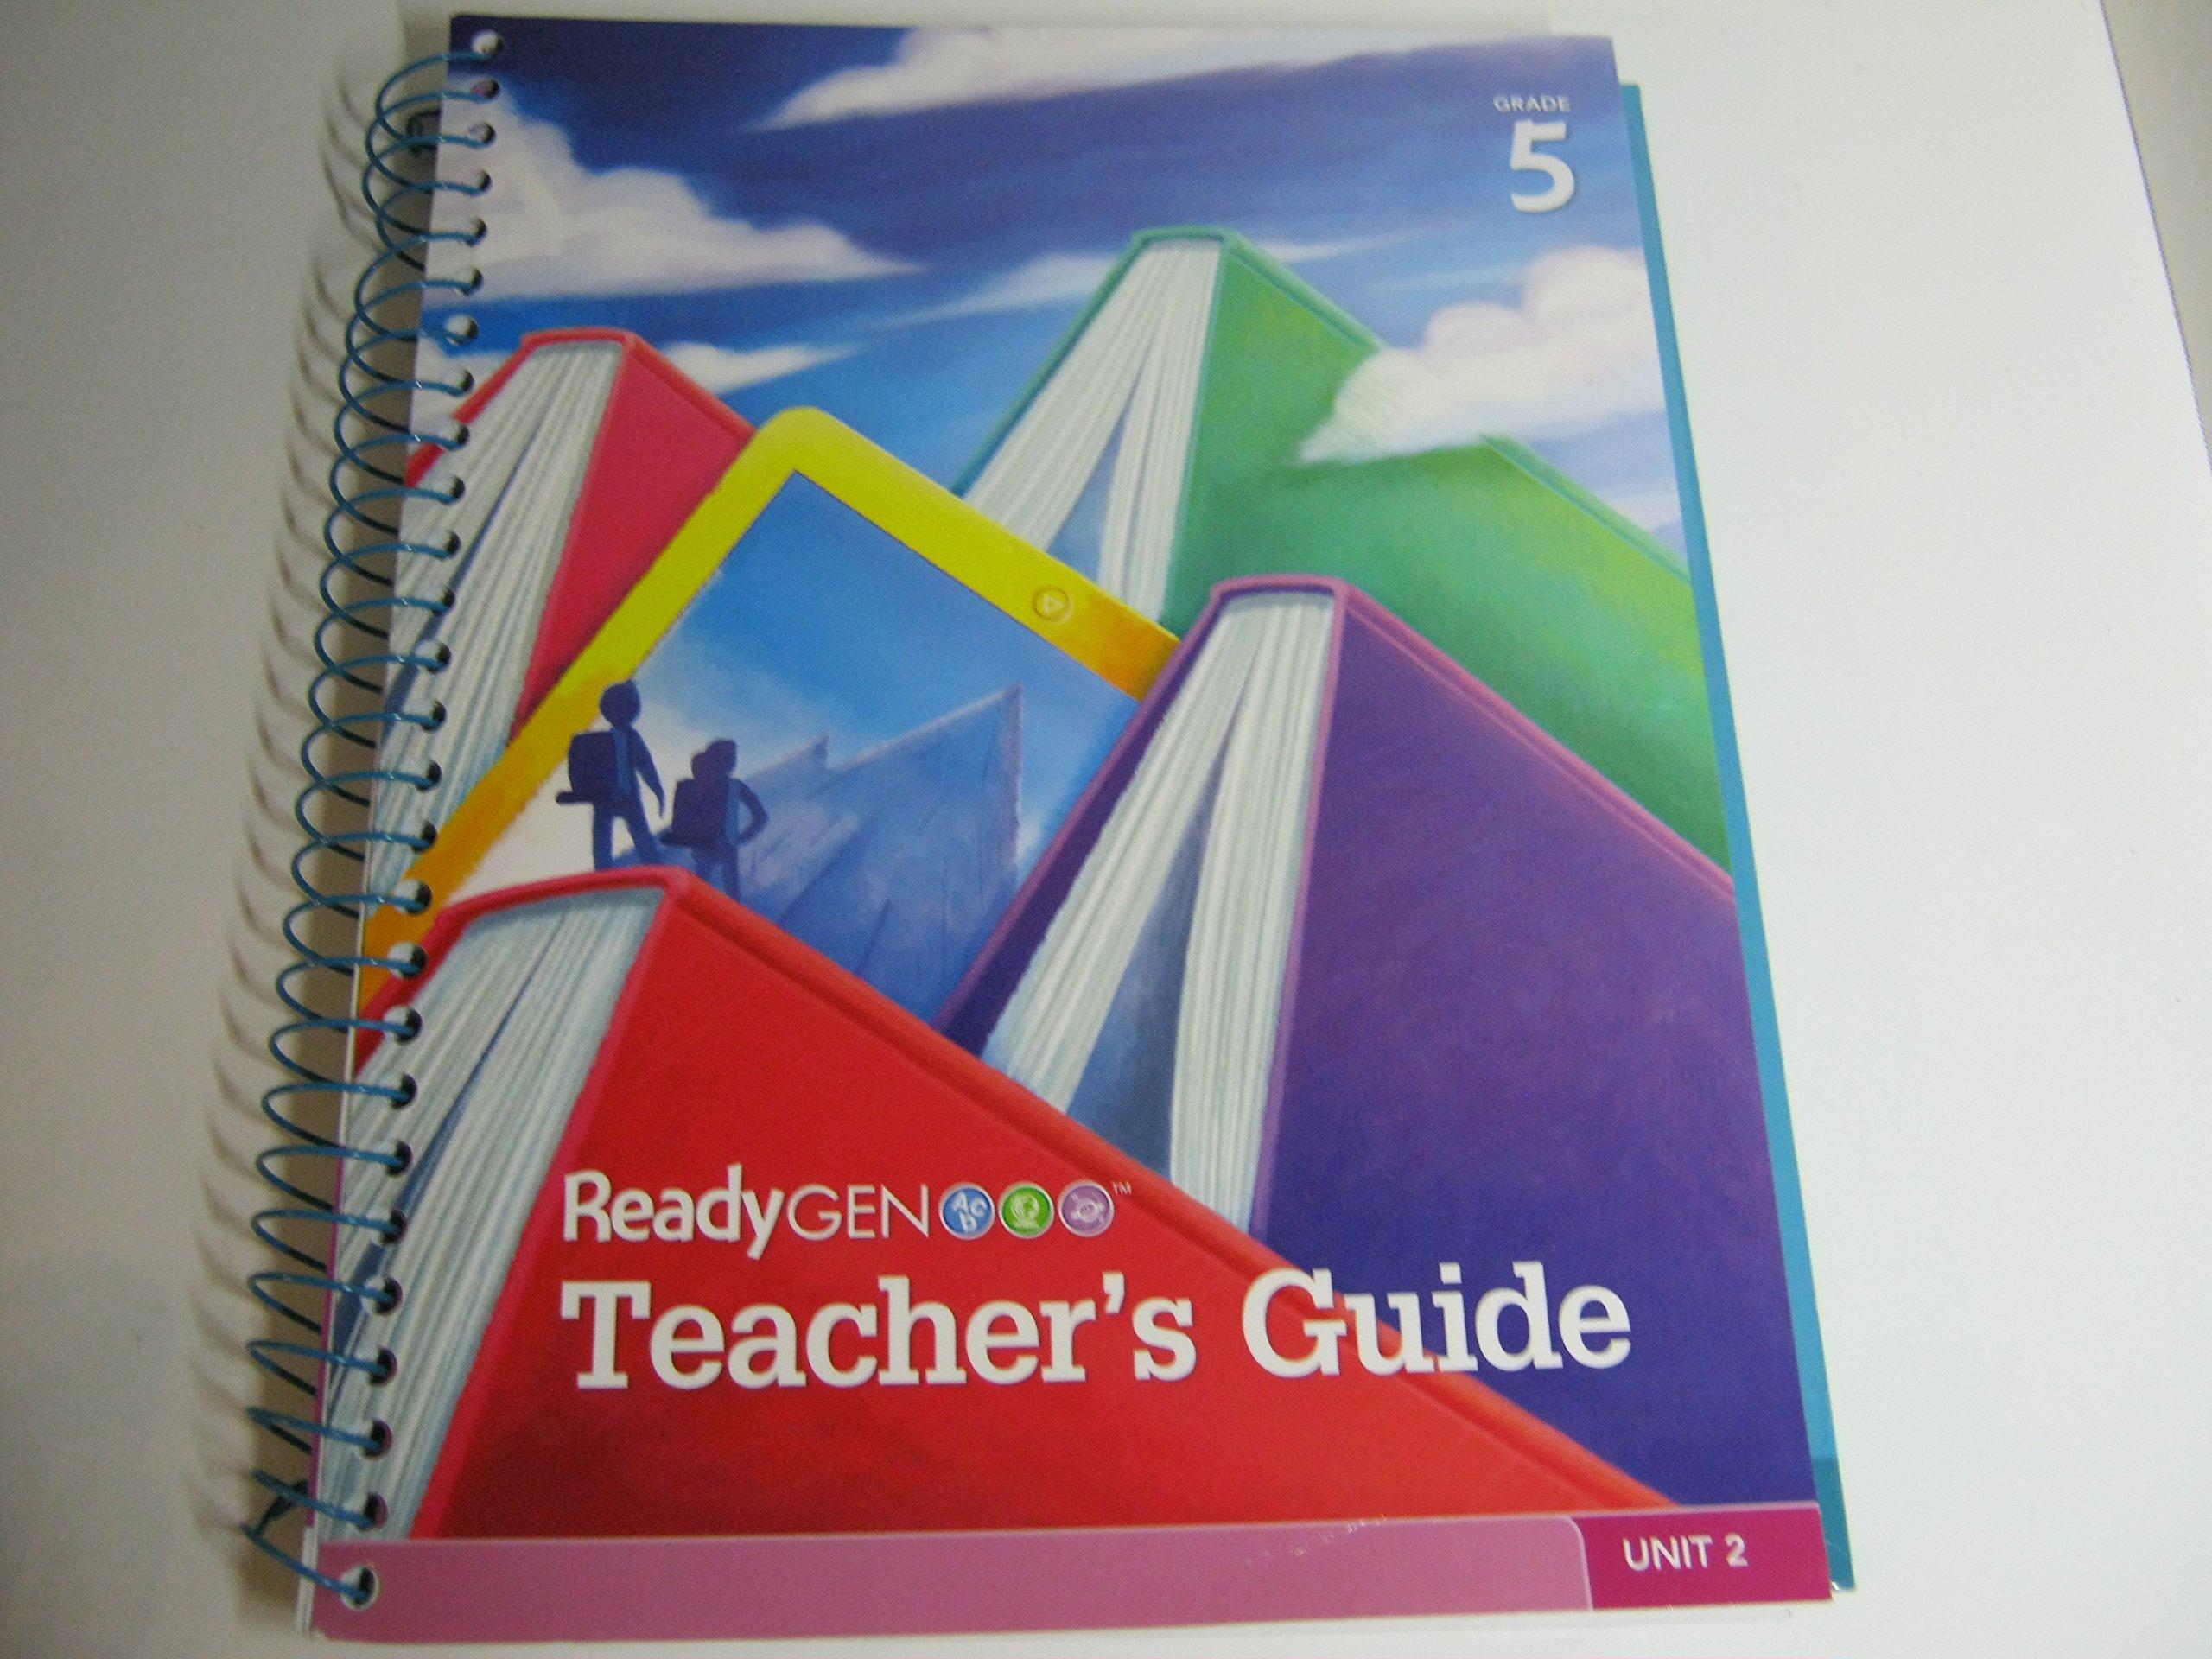 ReadyGen Teacher's Guide Grade 5 Unit 2: 9780328788774: Amazon.com: Books